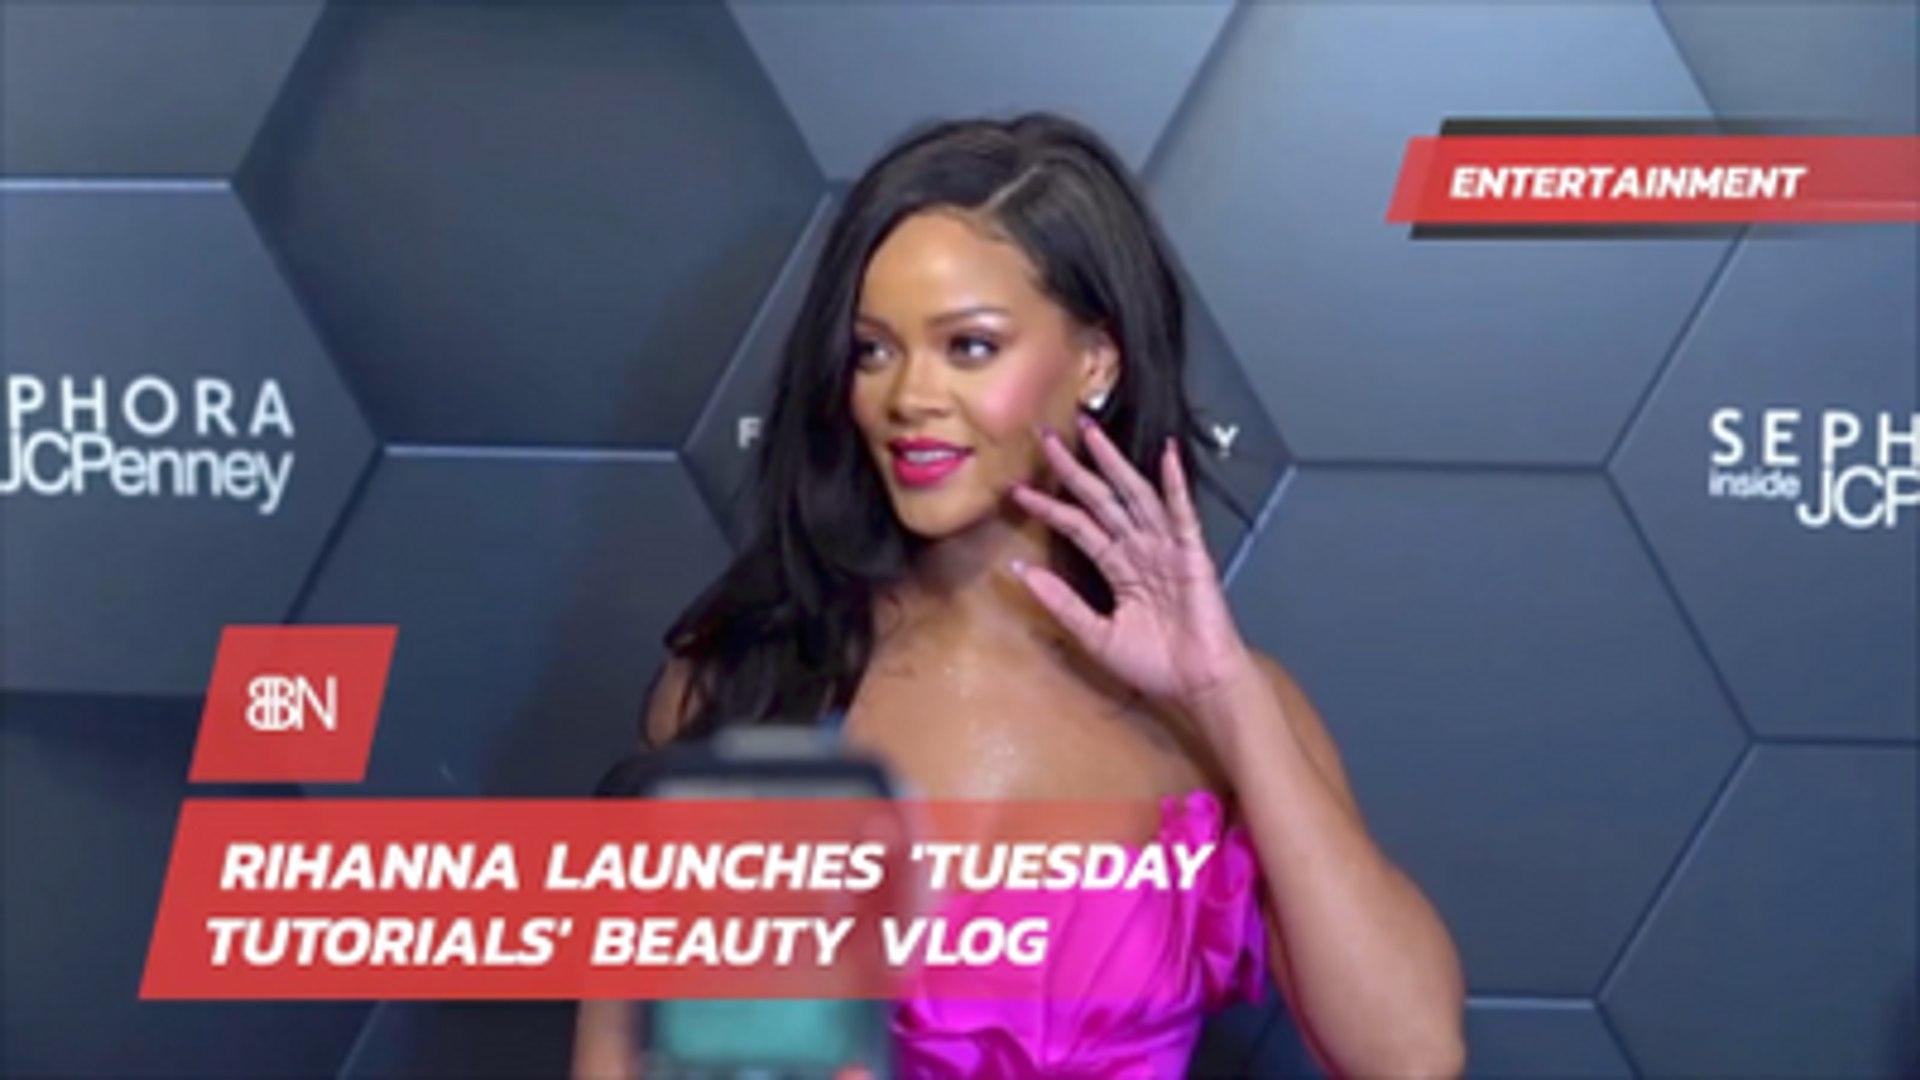 Rihanna Takes Over New Fashion And Beauty Vlog